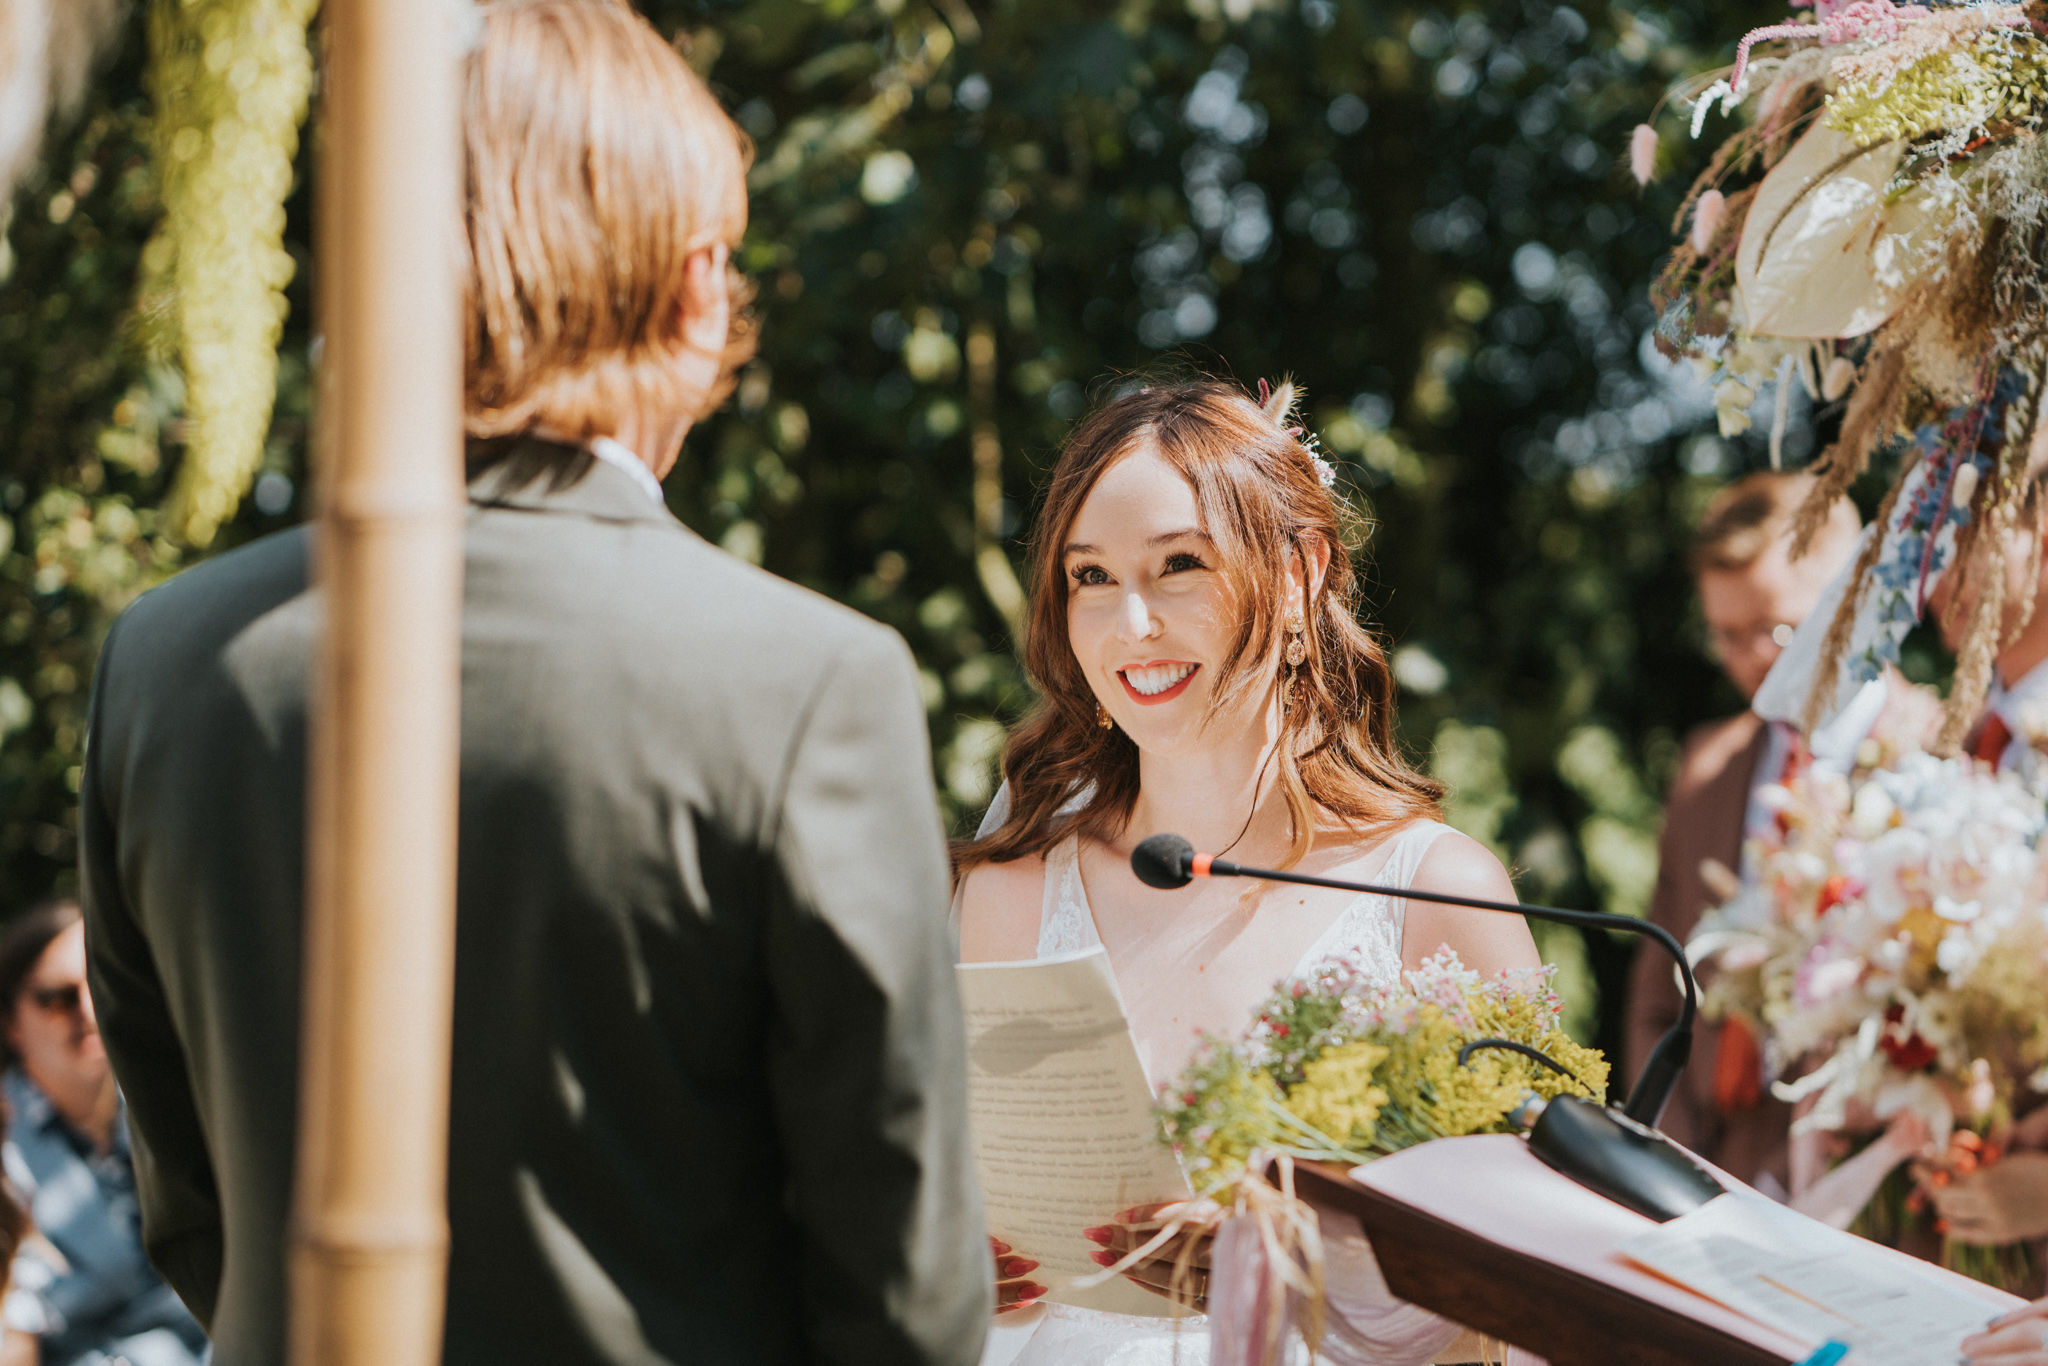 emi-Jack-boho-diy-wedding-eggington-house-grace-elizabeth-colchester-essex-alternative-wedding-photographer-suffolk-norfolk-devon (16 of 56).jpg